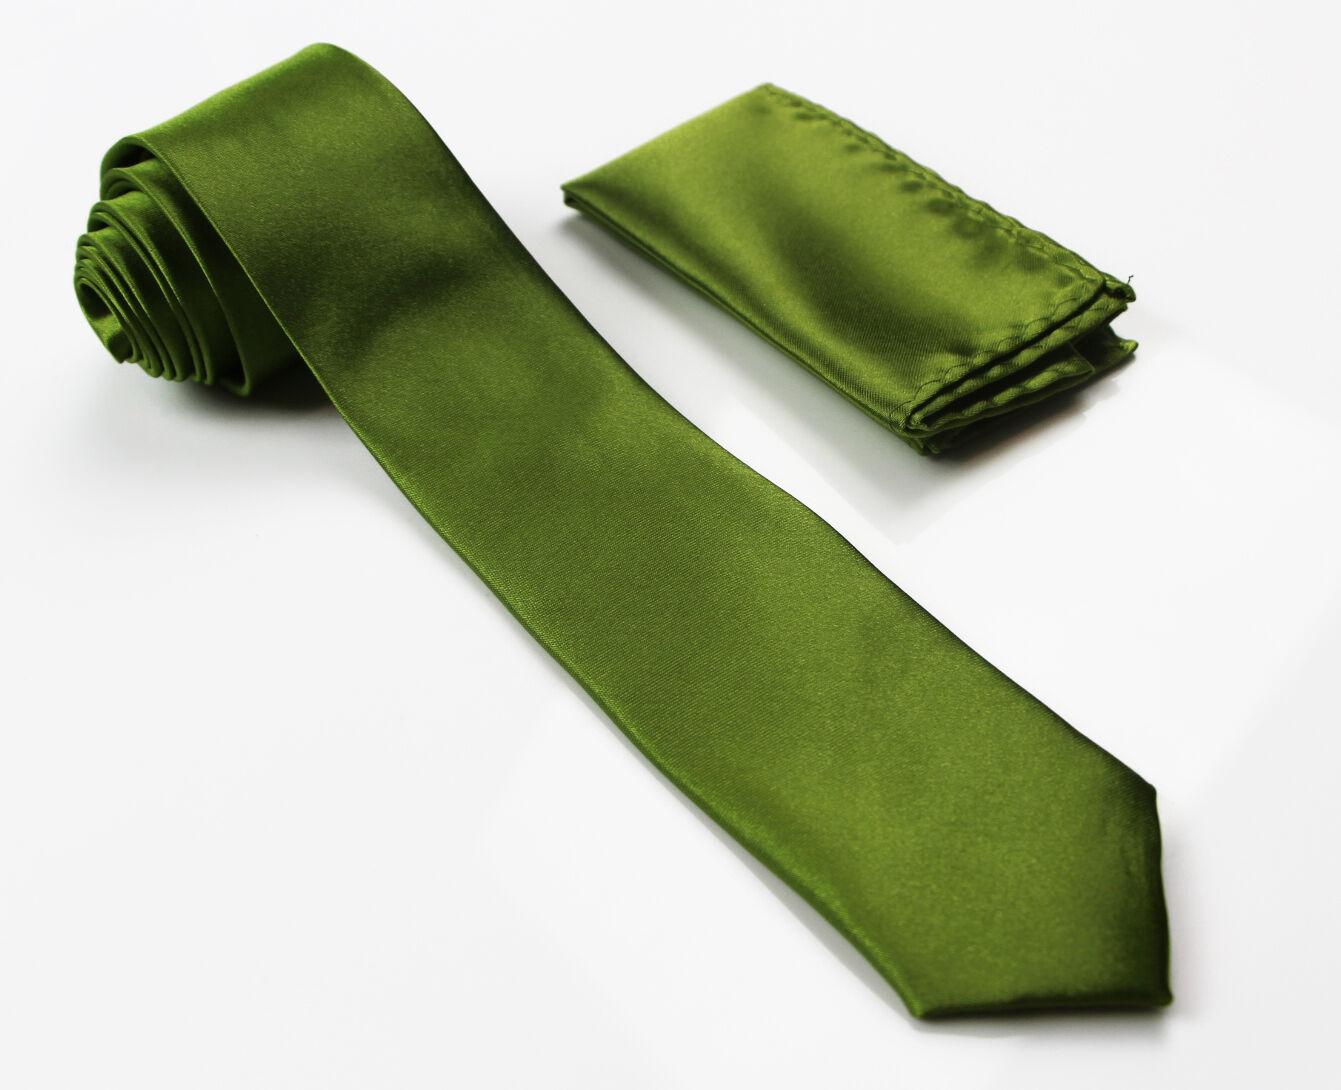 LIGHT GREEN MATCHING TIE SET 2 PIECE POCKET SQUARE HANKY /& FORMAL SKINNY NECKTIE